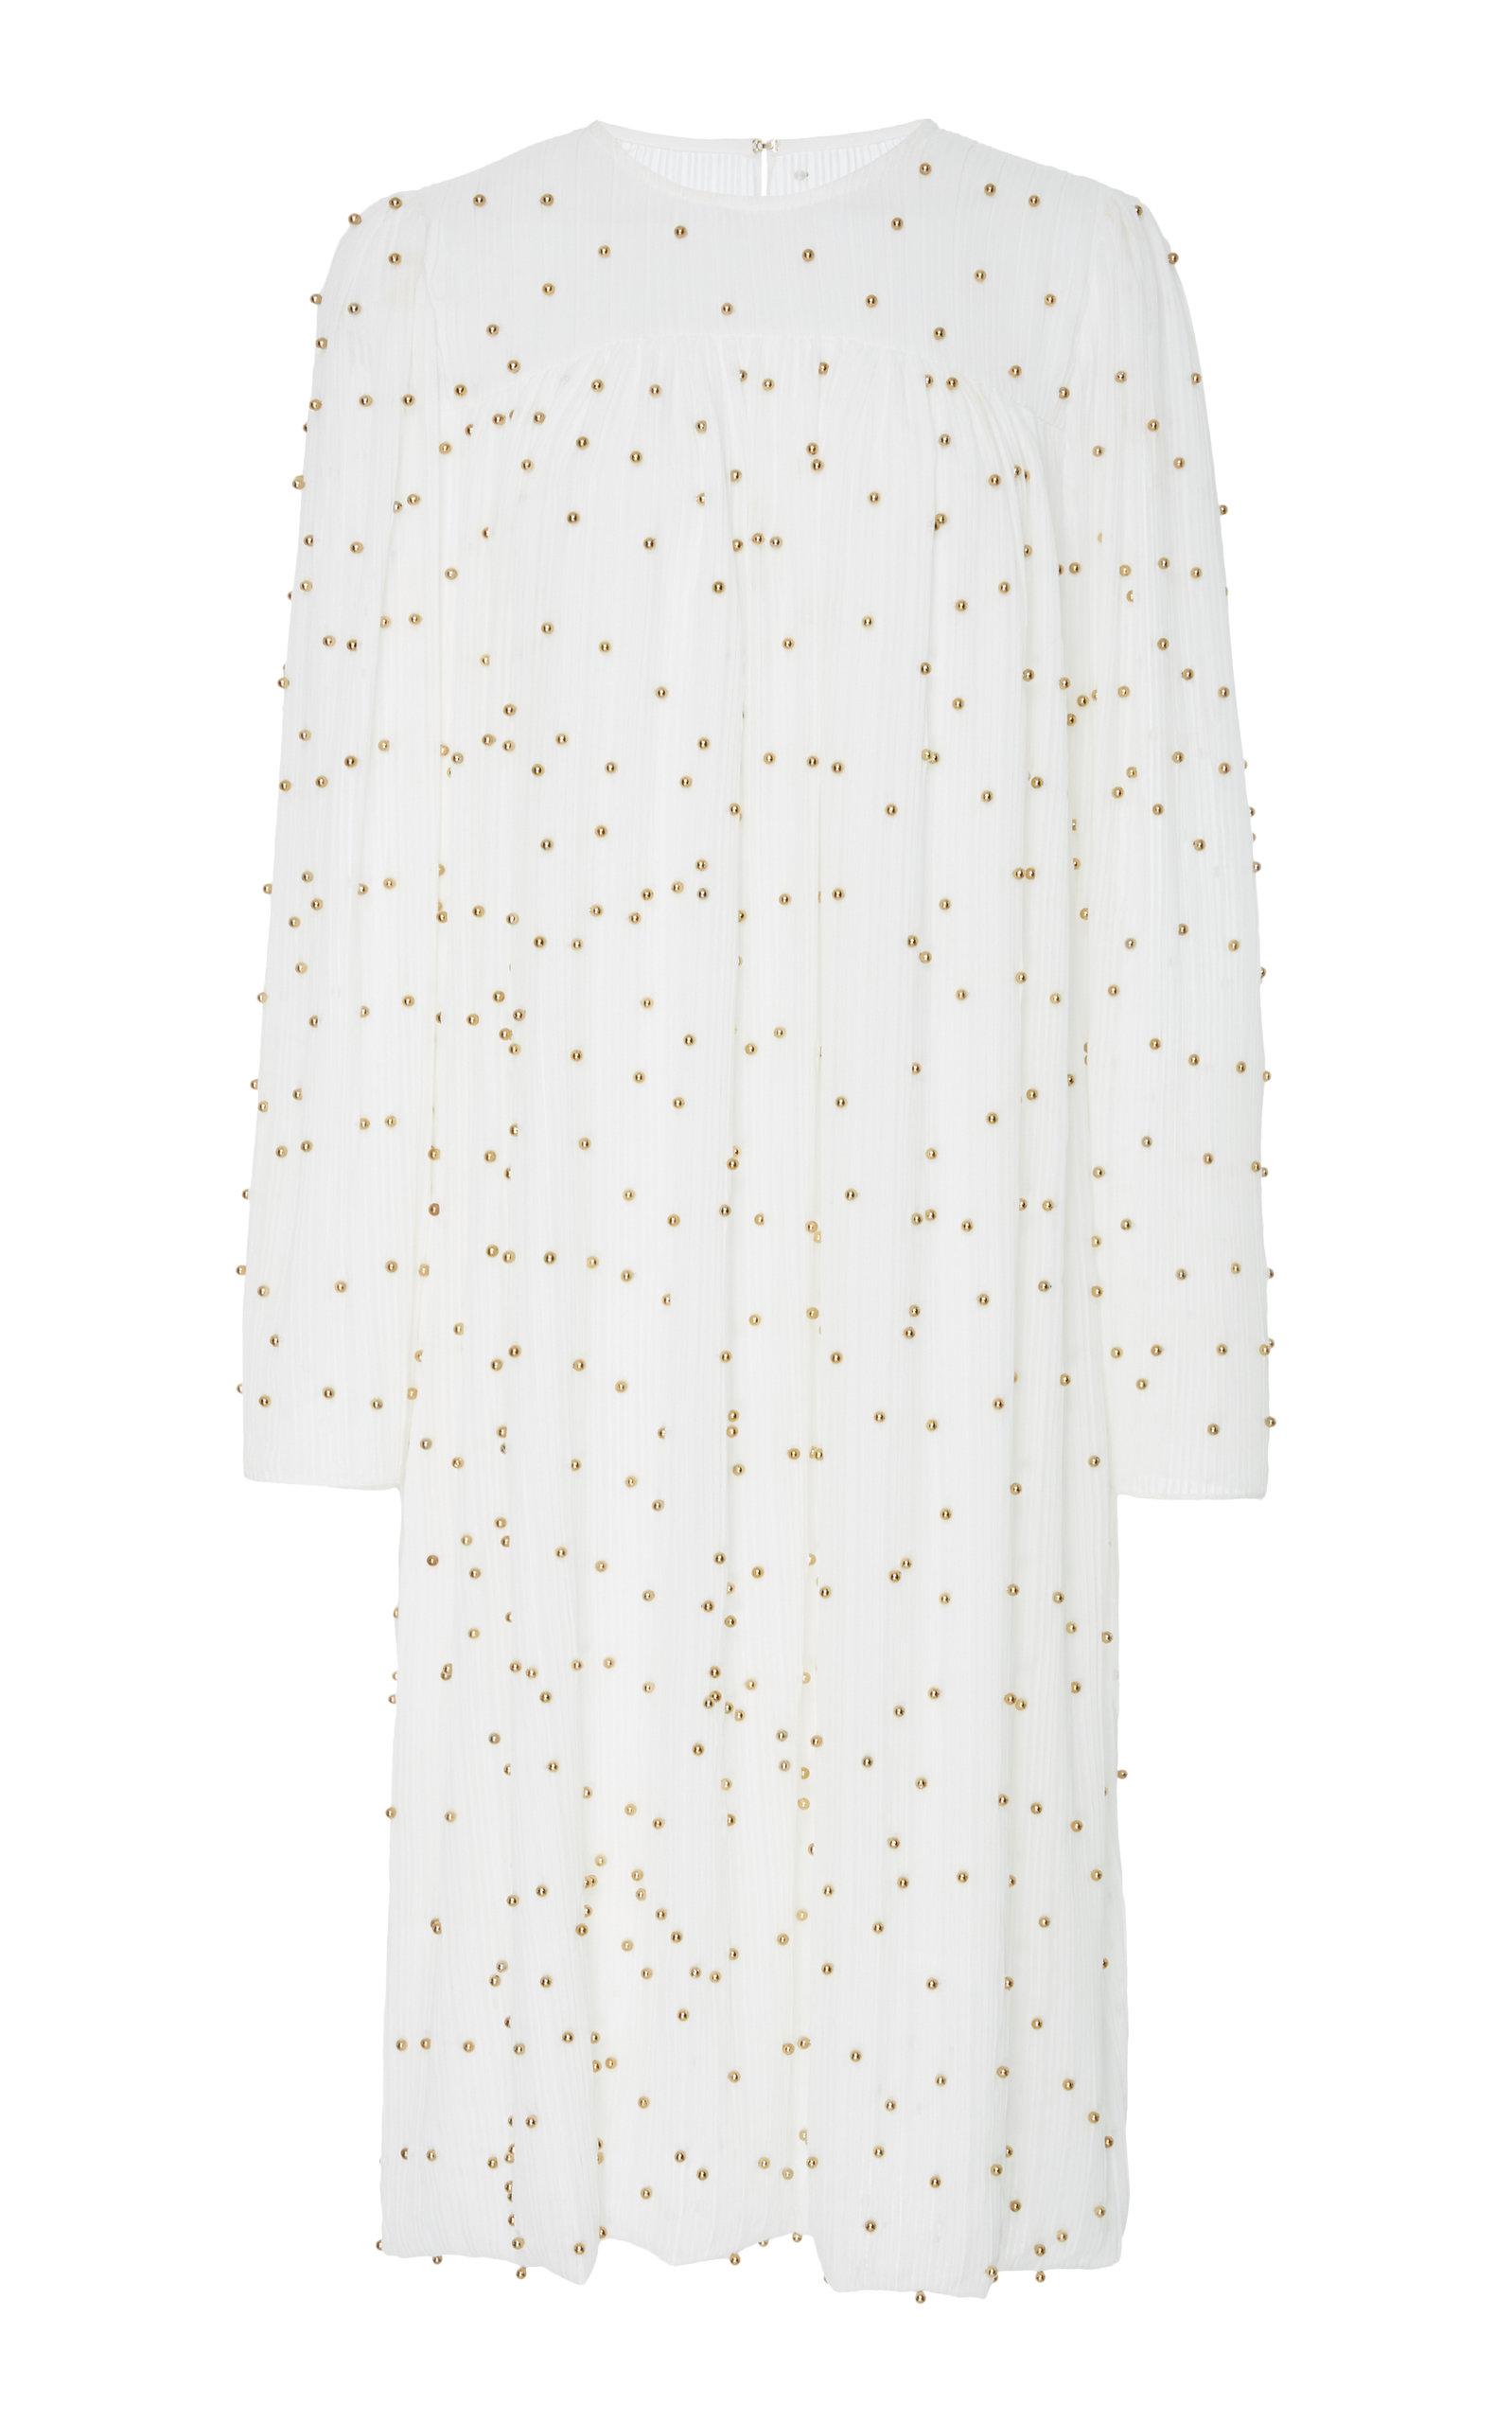 ALENA AKHMADULLINA Pearl Embroidered Dress in White